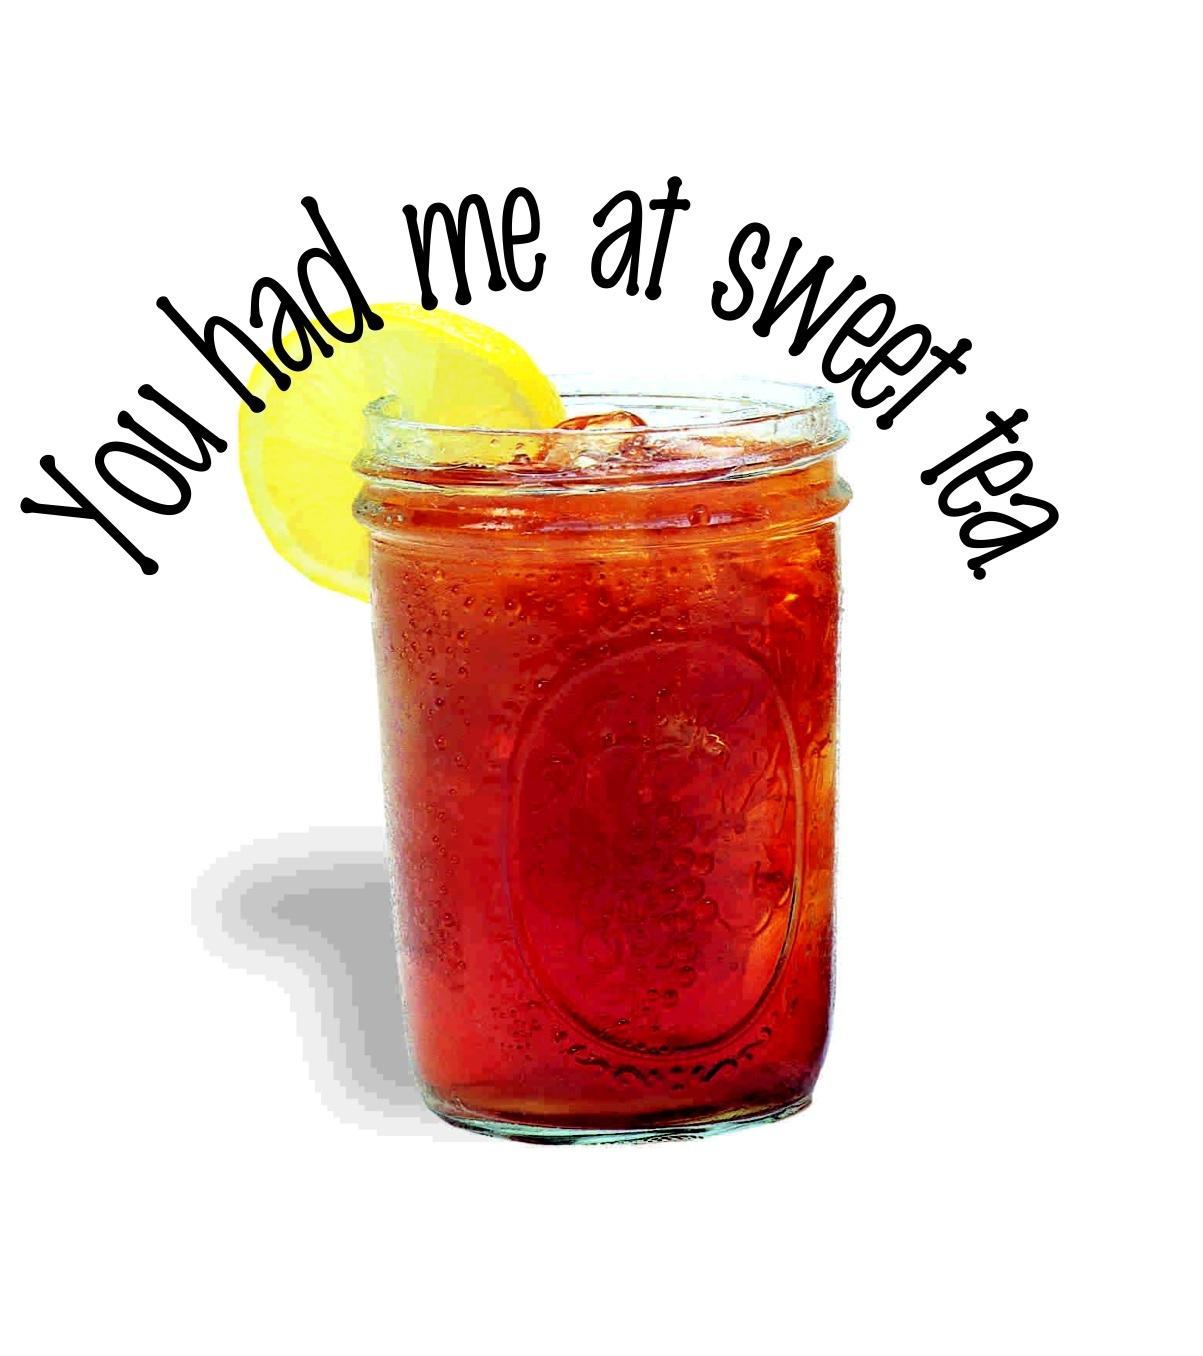 Iced tea sweet tea clip art